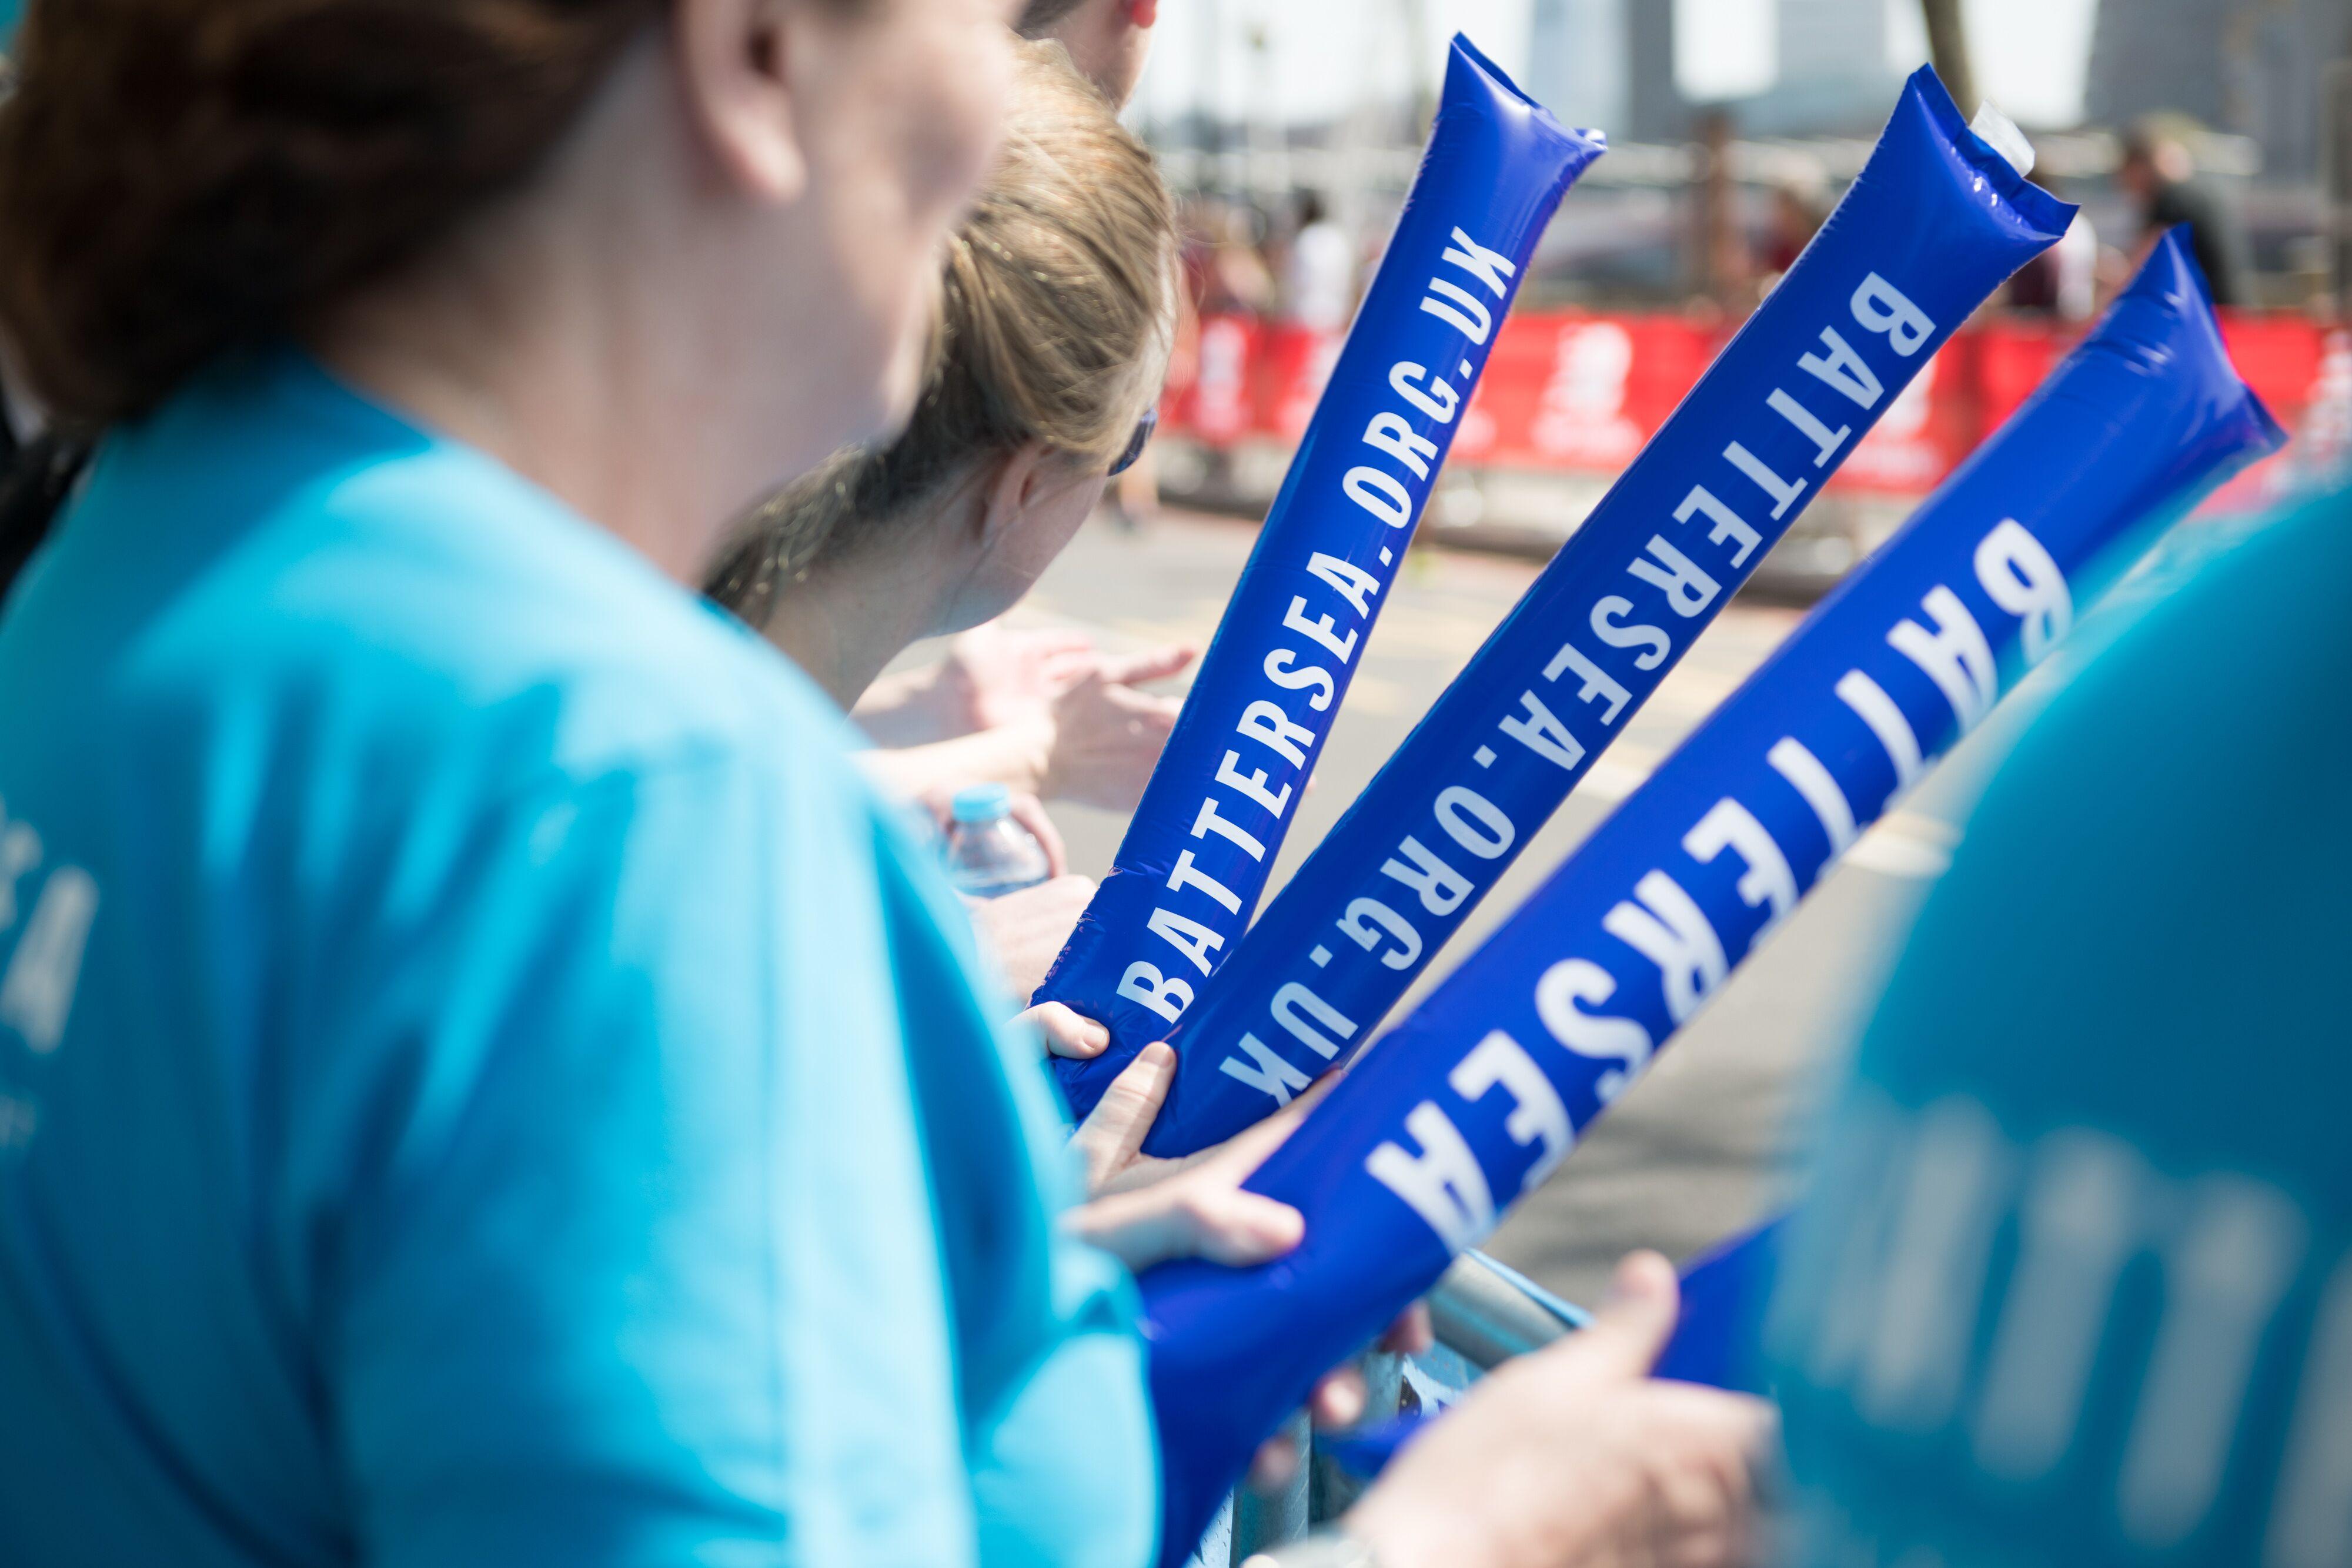 London Landmarks Half Marathon Cheer Team